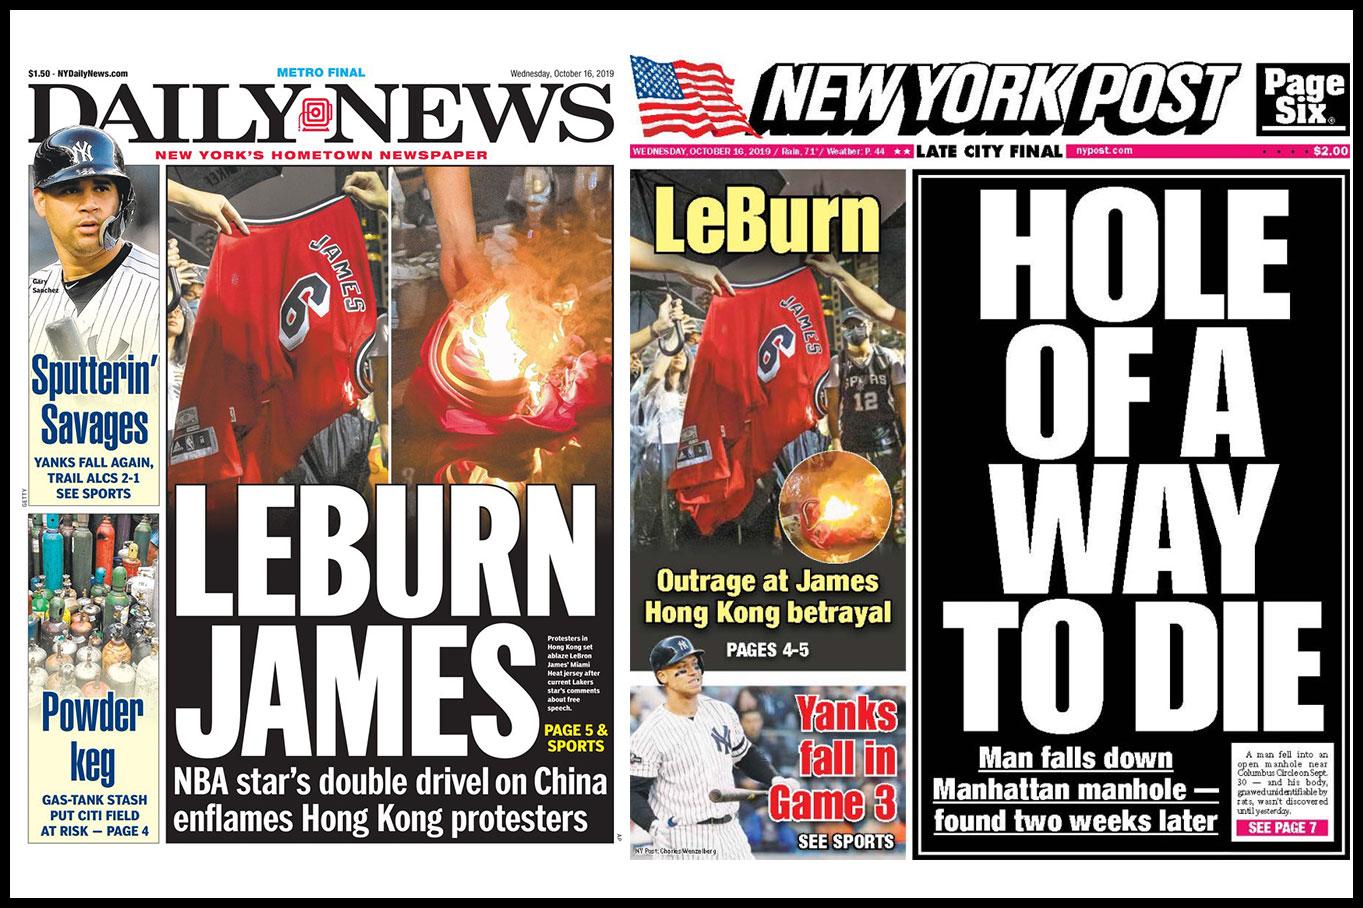 LeBron James is now LeBurn James